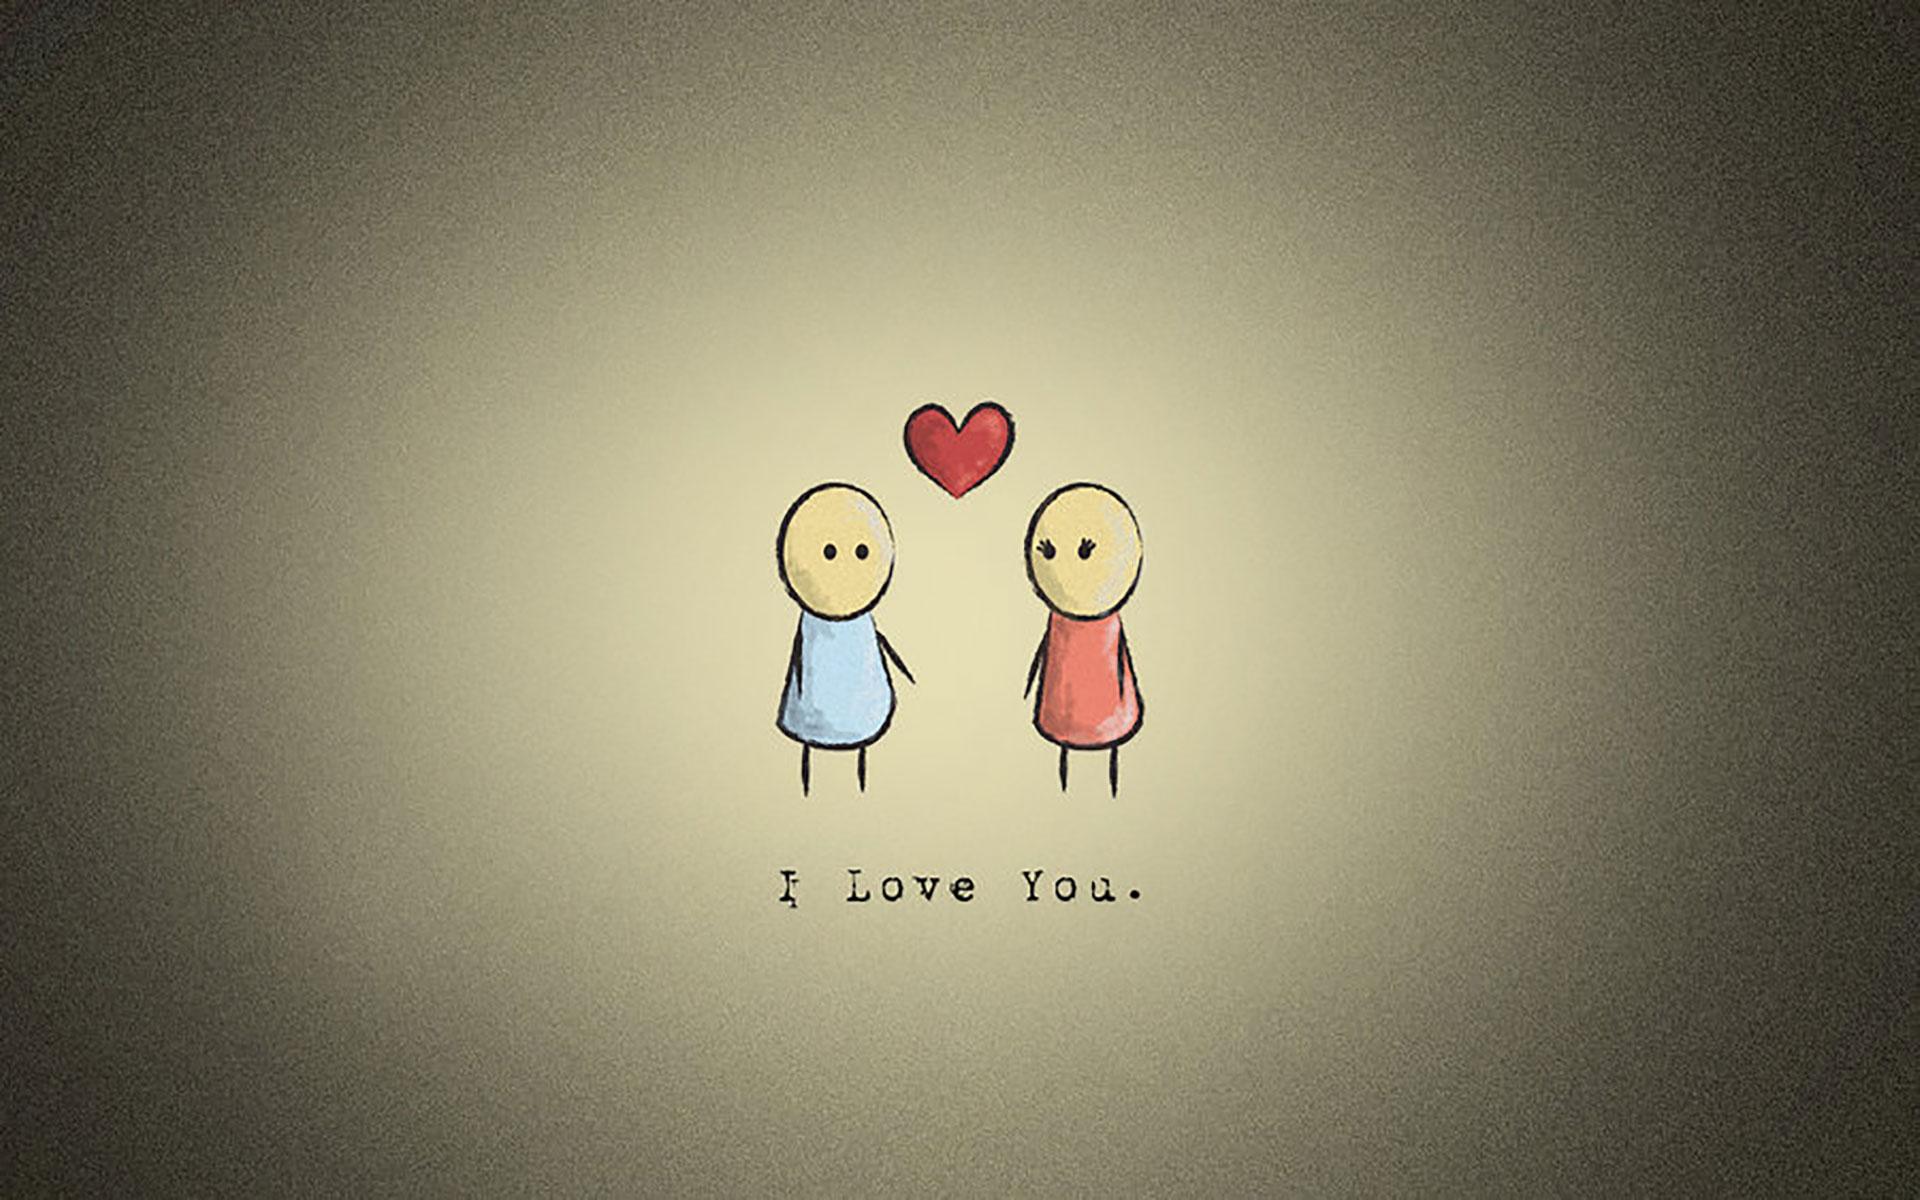 Wonderful Wallpaper I Love You Cartoon - Stunning-Love-You-Wallpaper  Snapshot_84851   .jpg